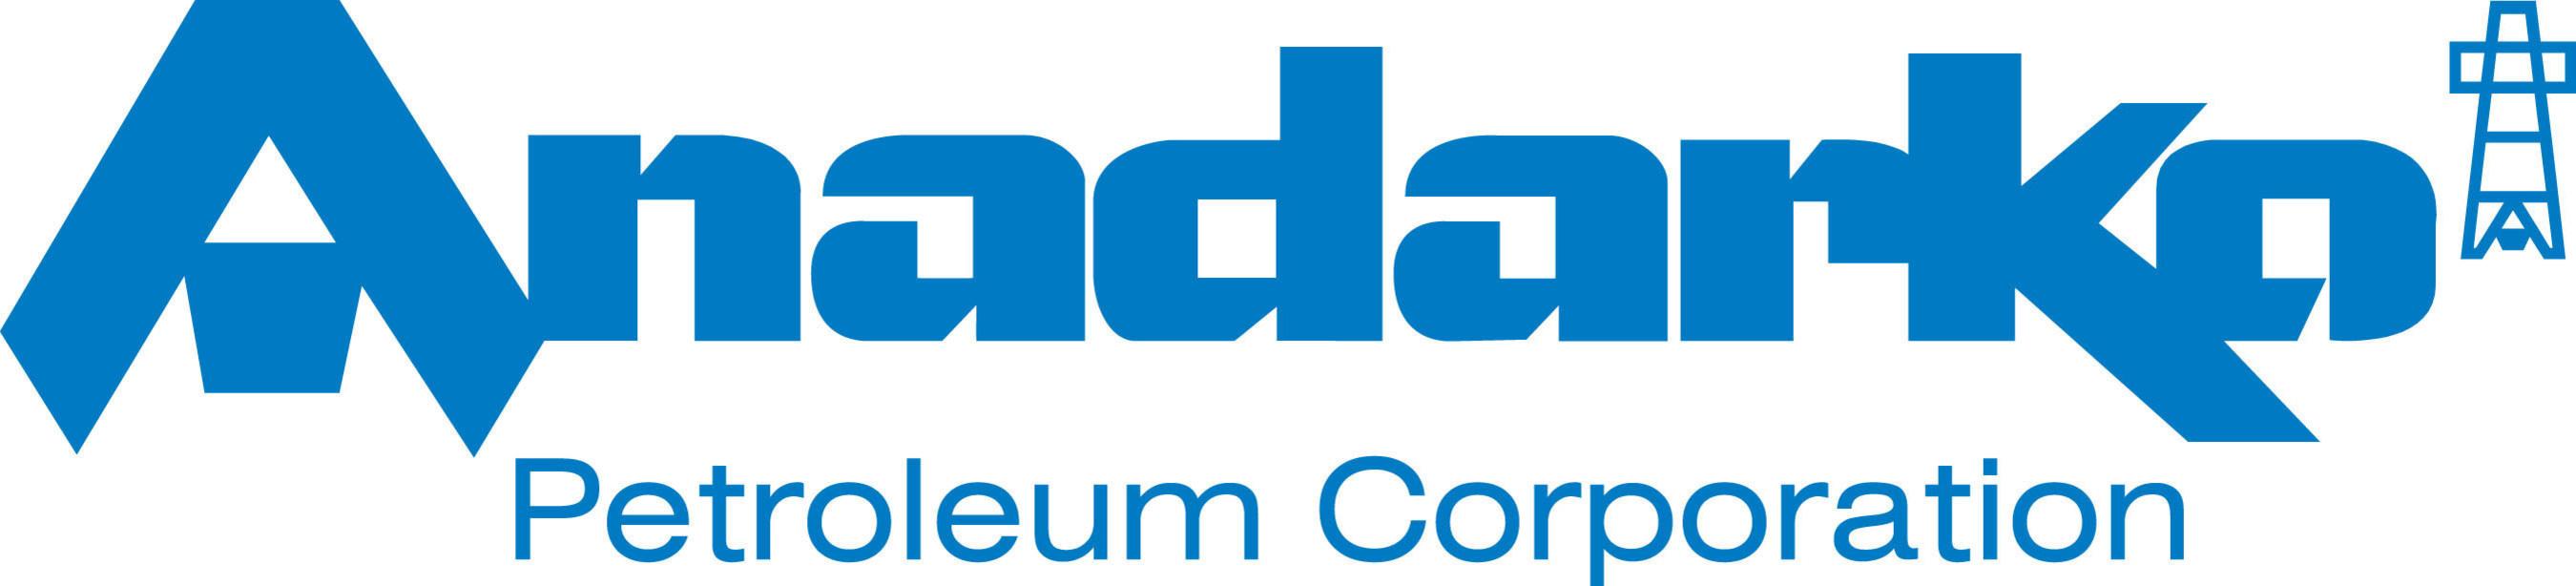 Anadarko Petroleum Corp. Logo (PRNewsFoto/Anadarko Petroleum Corp.)